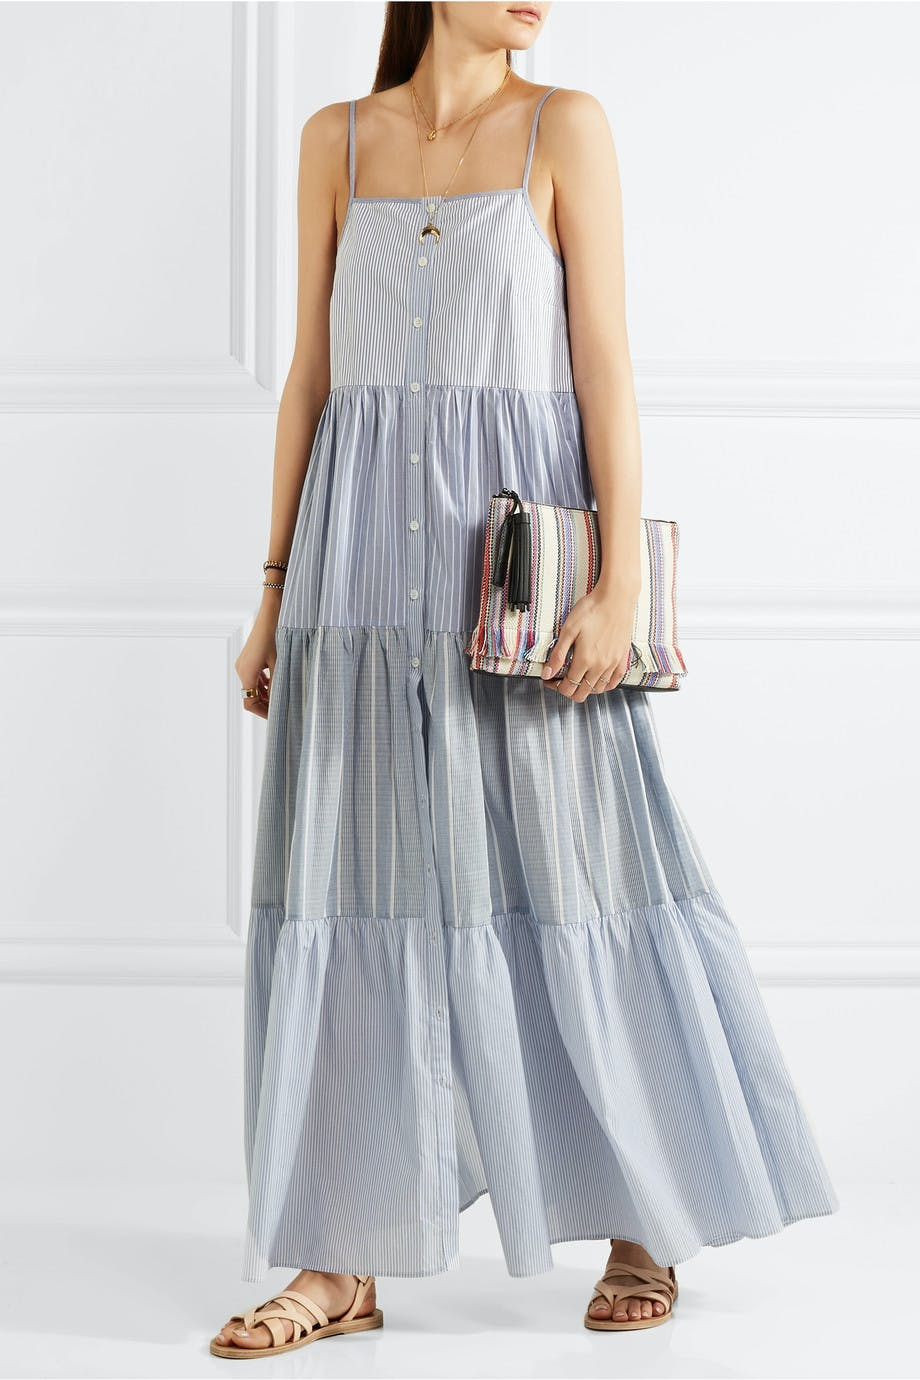 sea breezy maxi dress miami